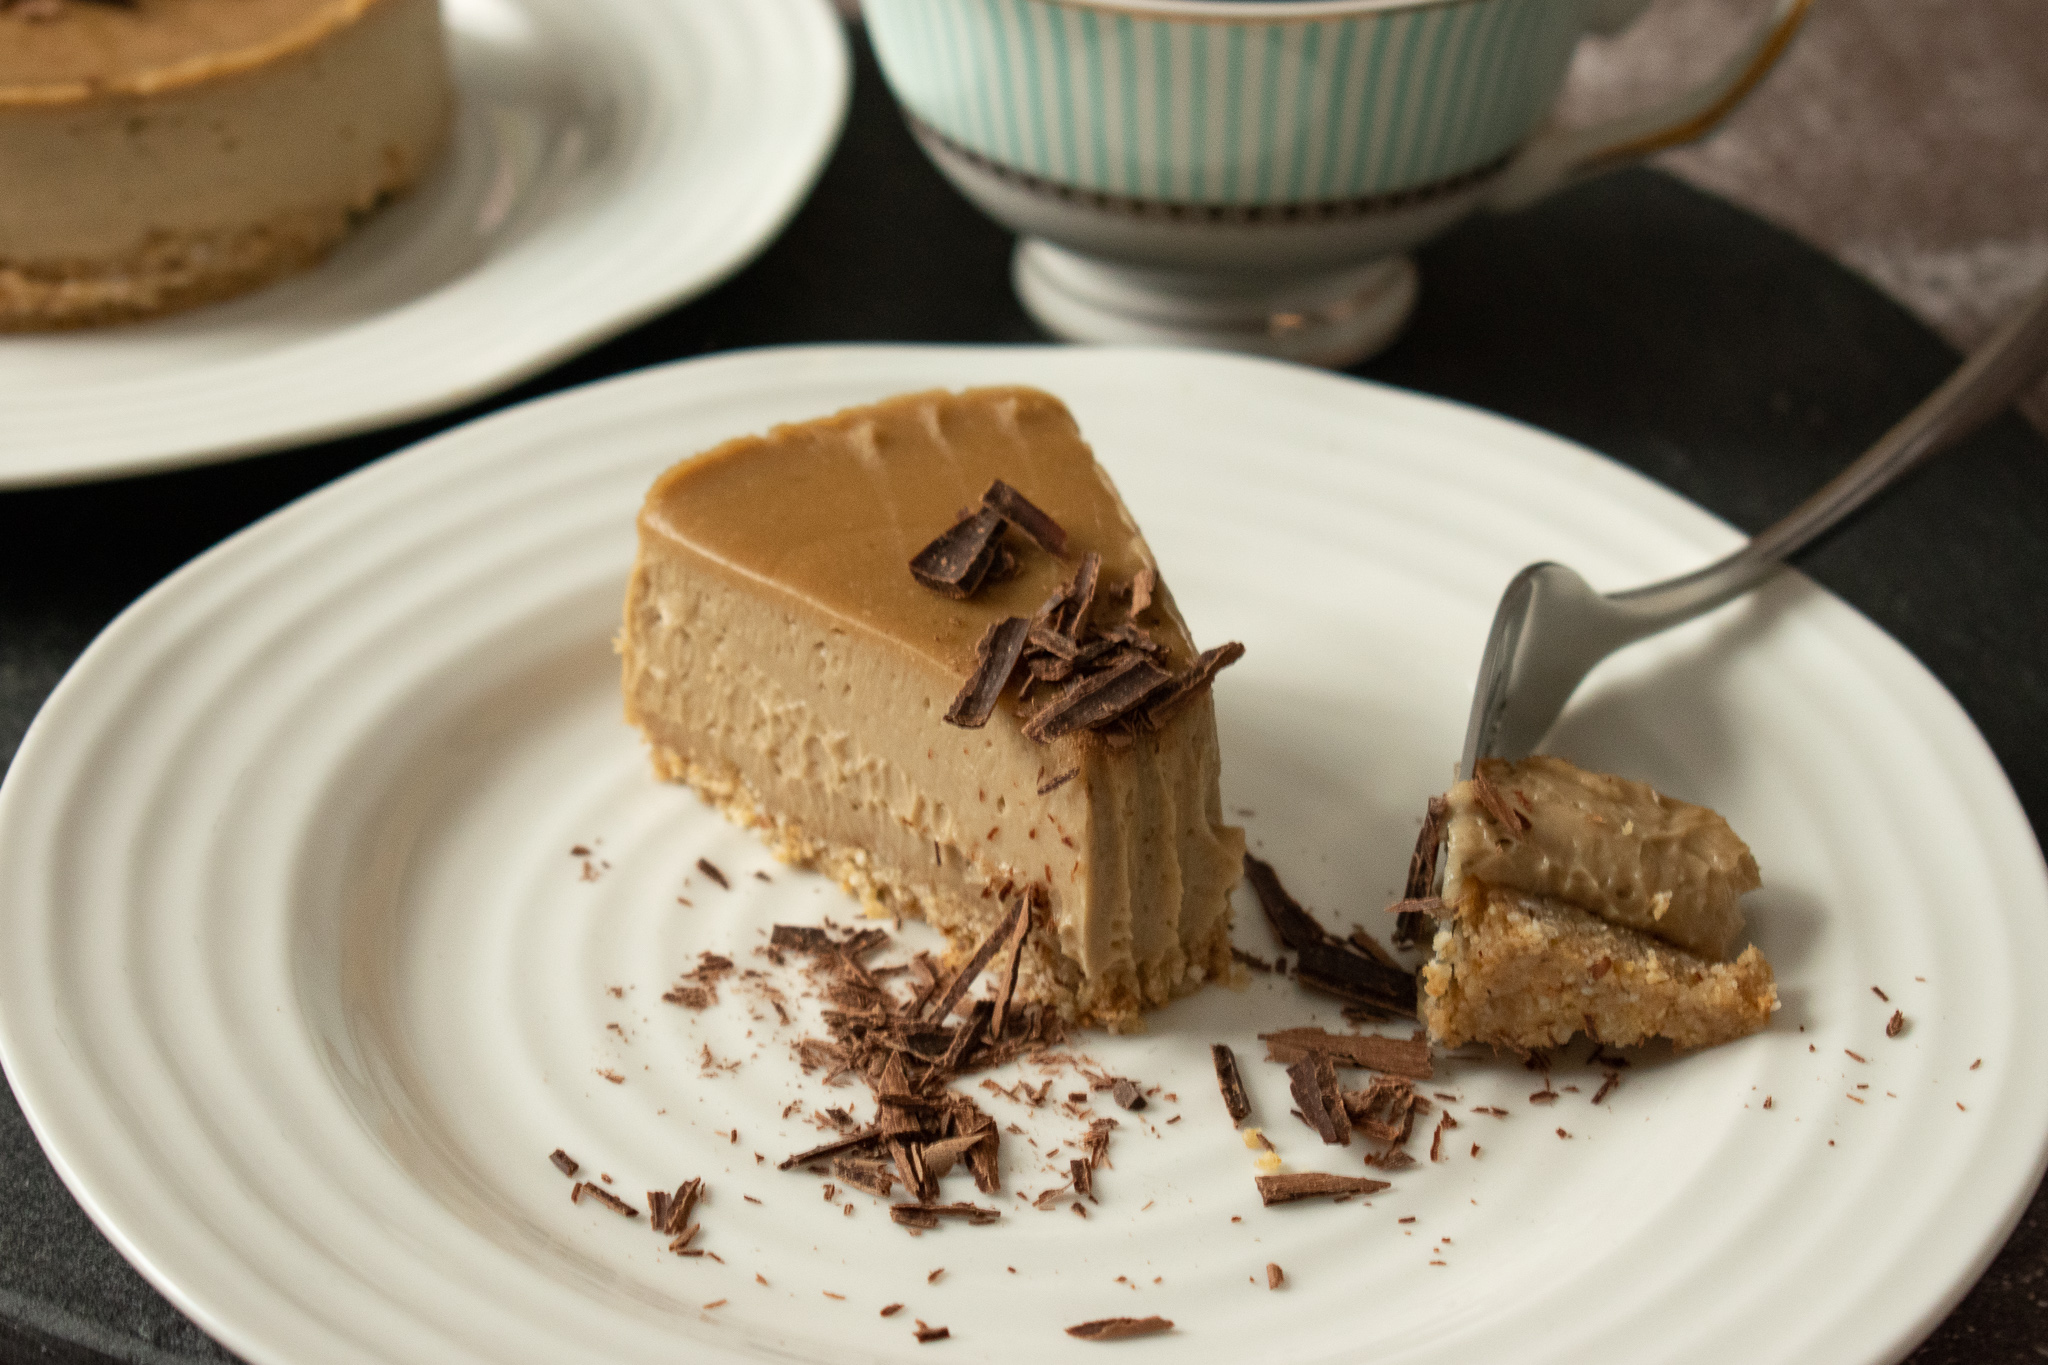 Espresso Vegan No Bake Cheesecake with chocolate